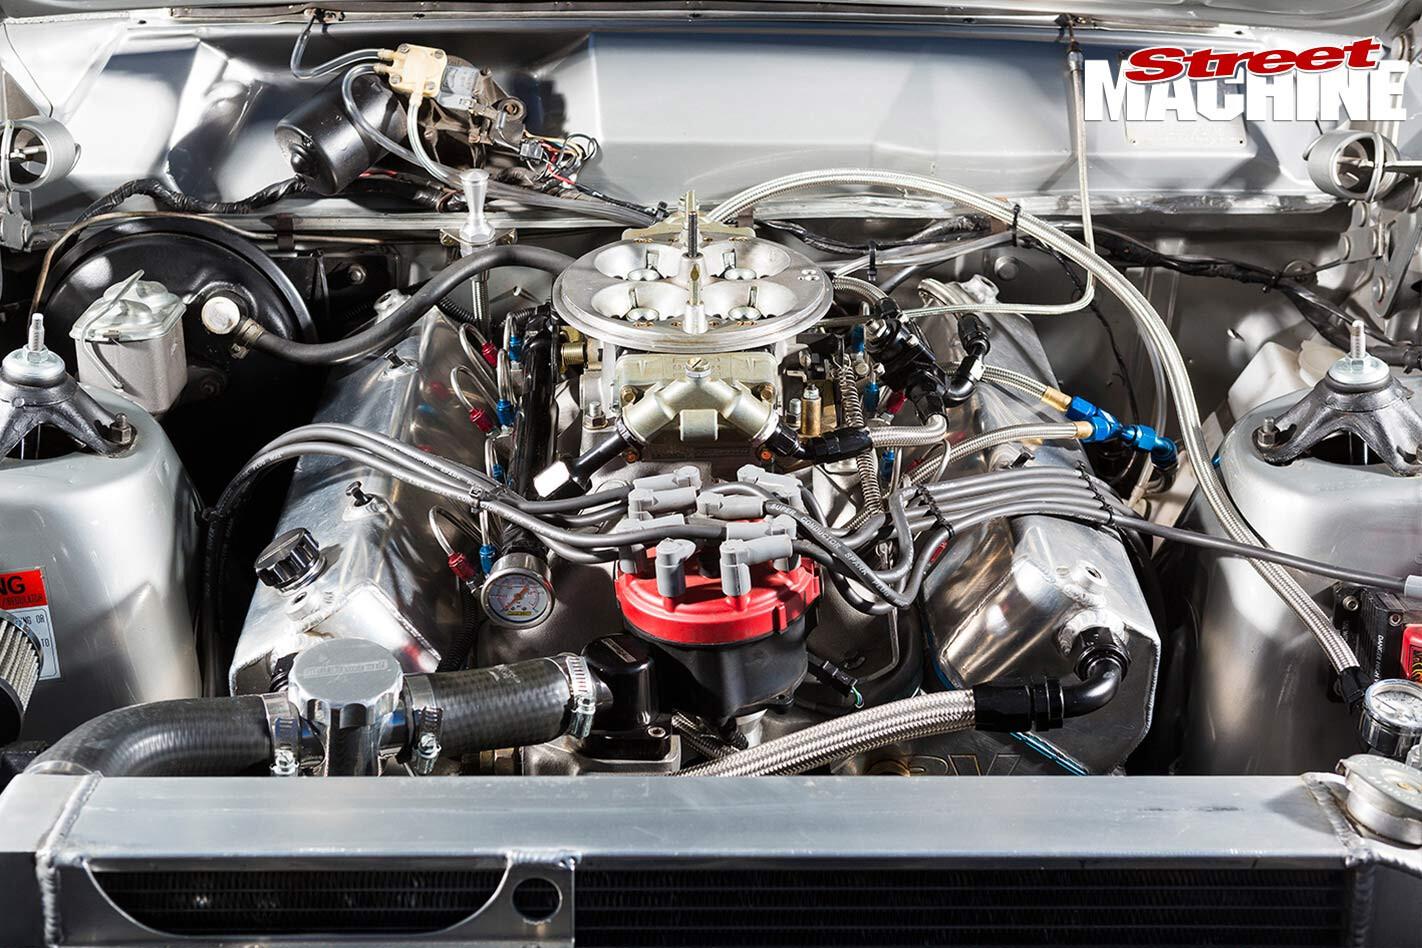 Ford Falcon engine bay